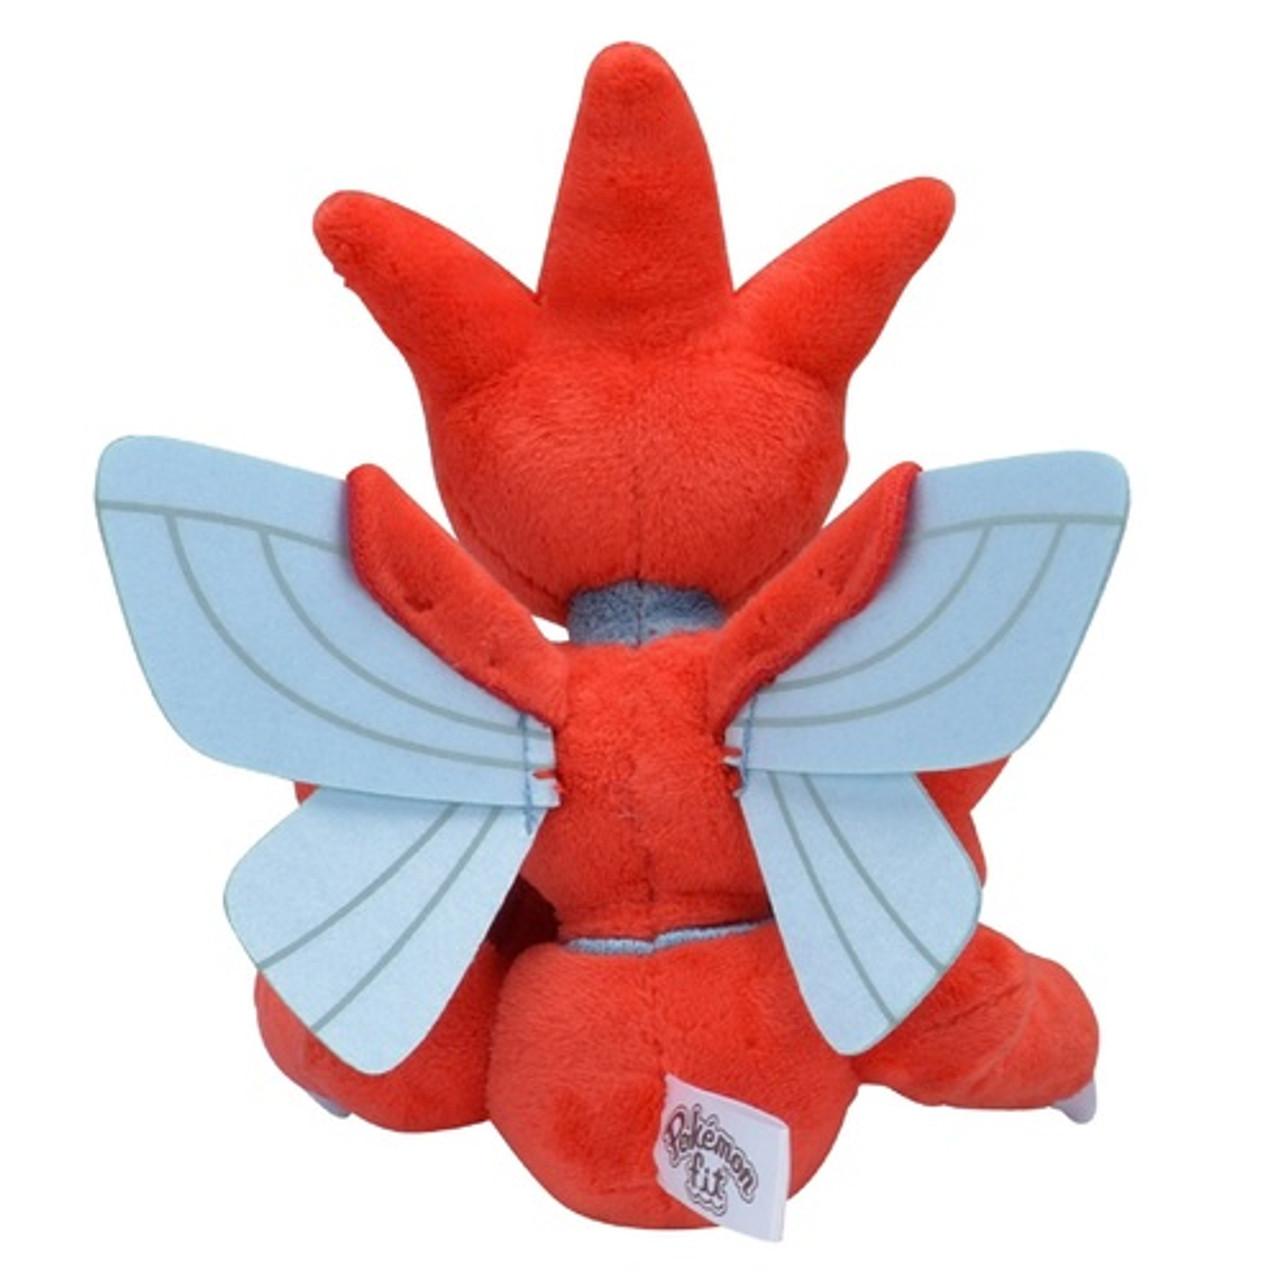 Pokemon Plush doll Pokémon fit Scizor 170x135x85mm Pokemon Center F//S NEW